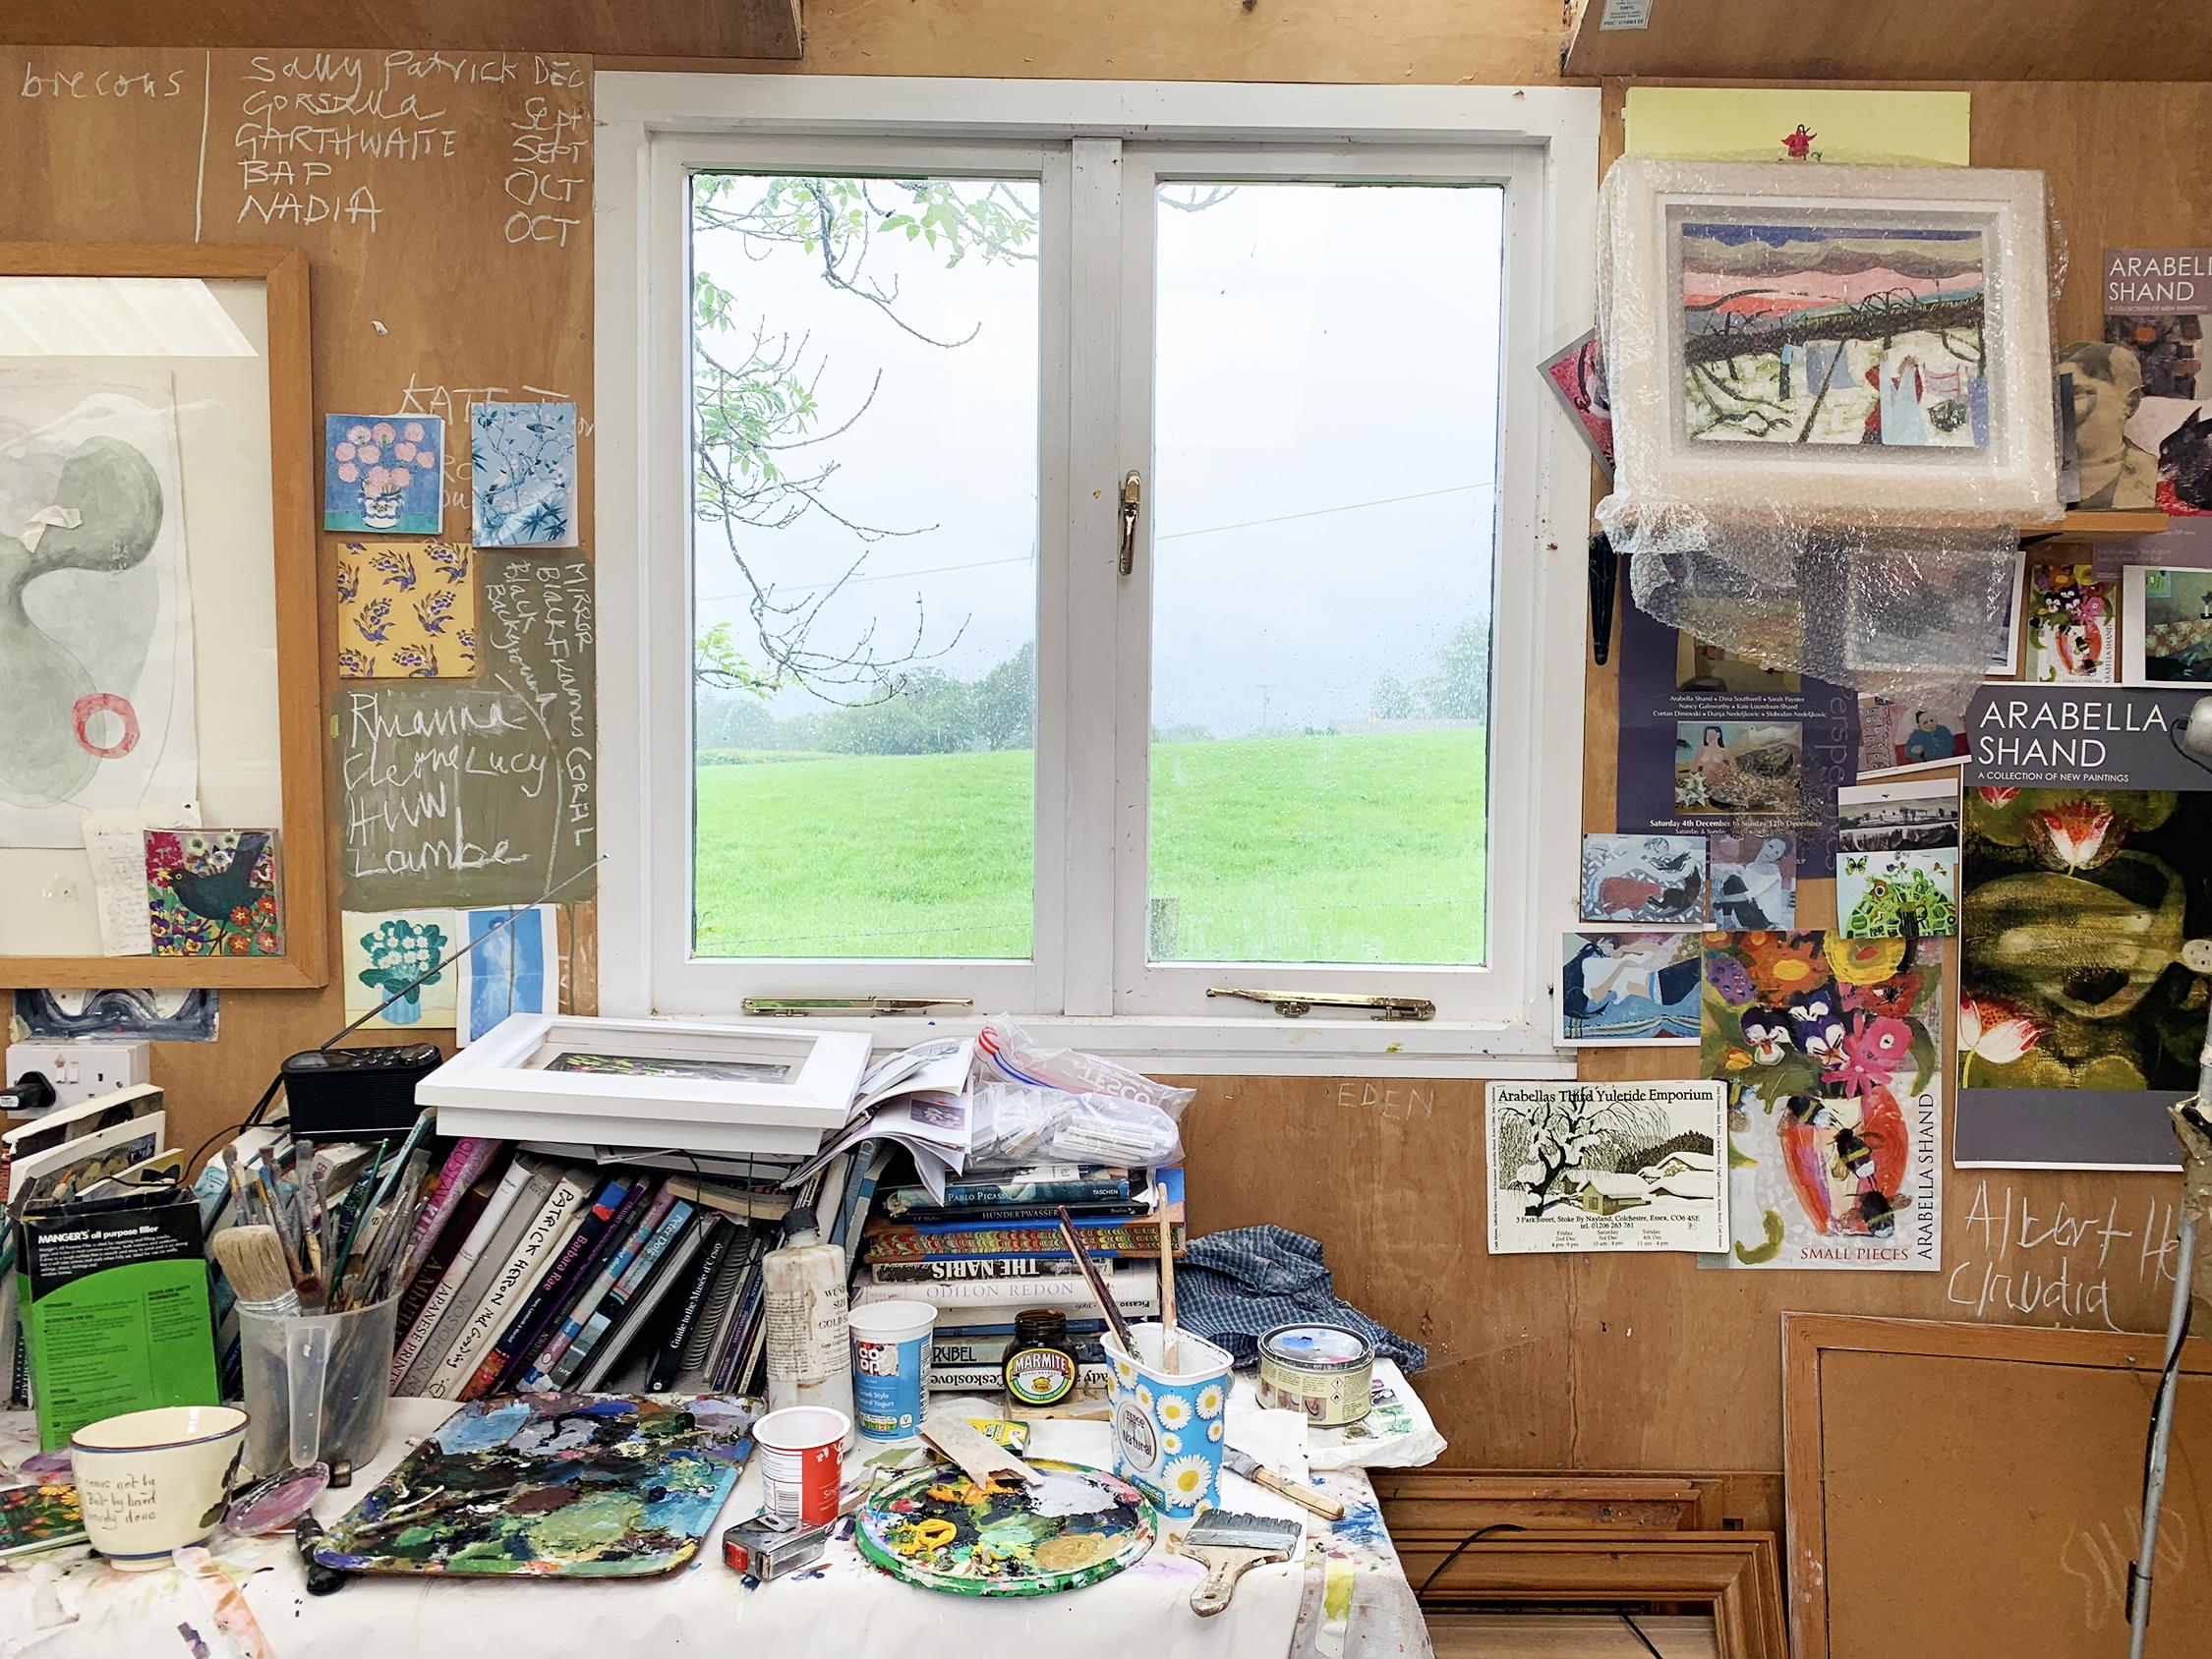 Arabella Shand's studio in Wales